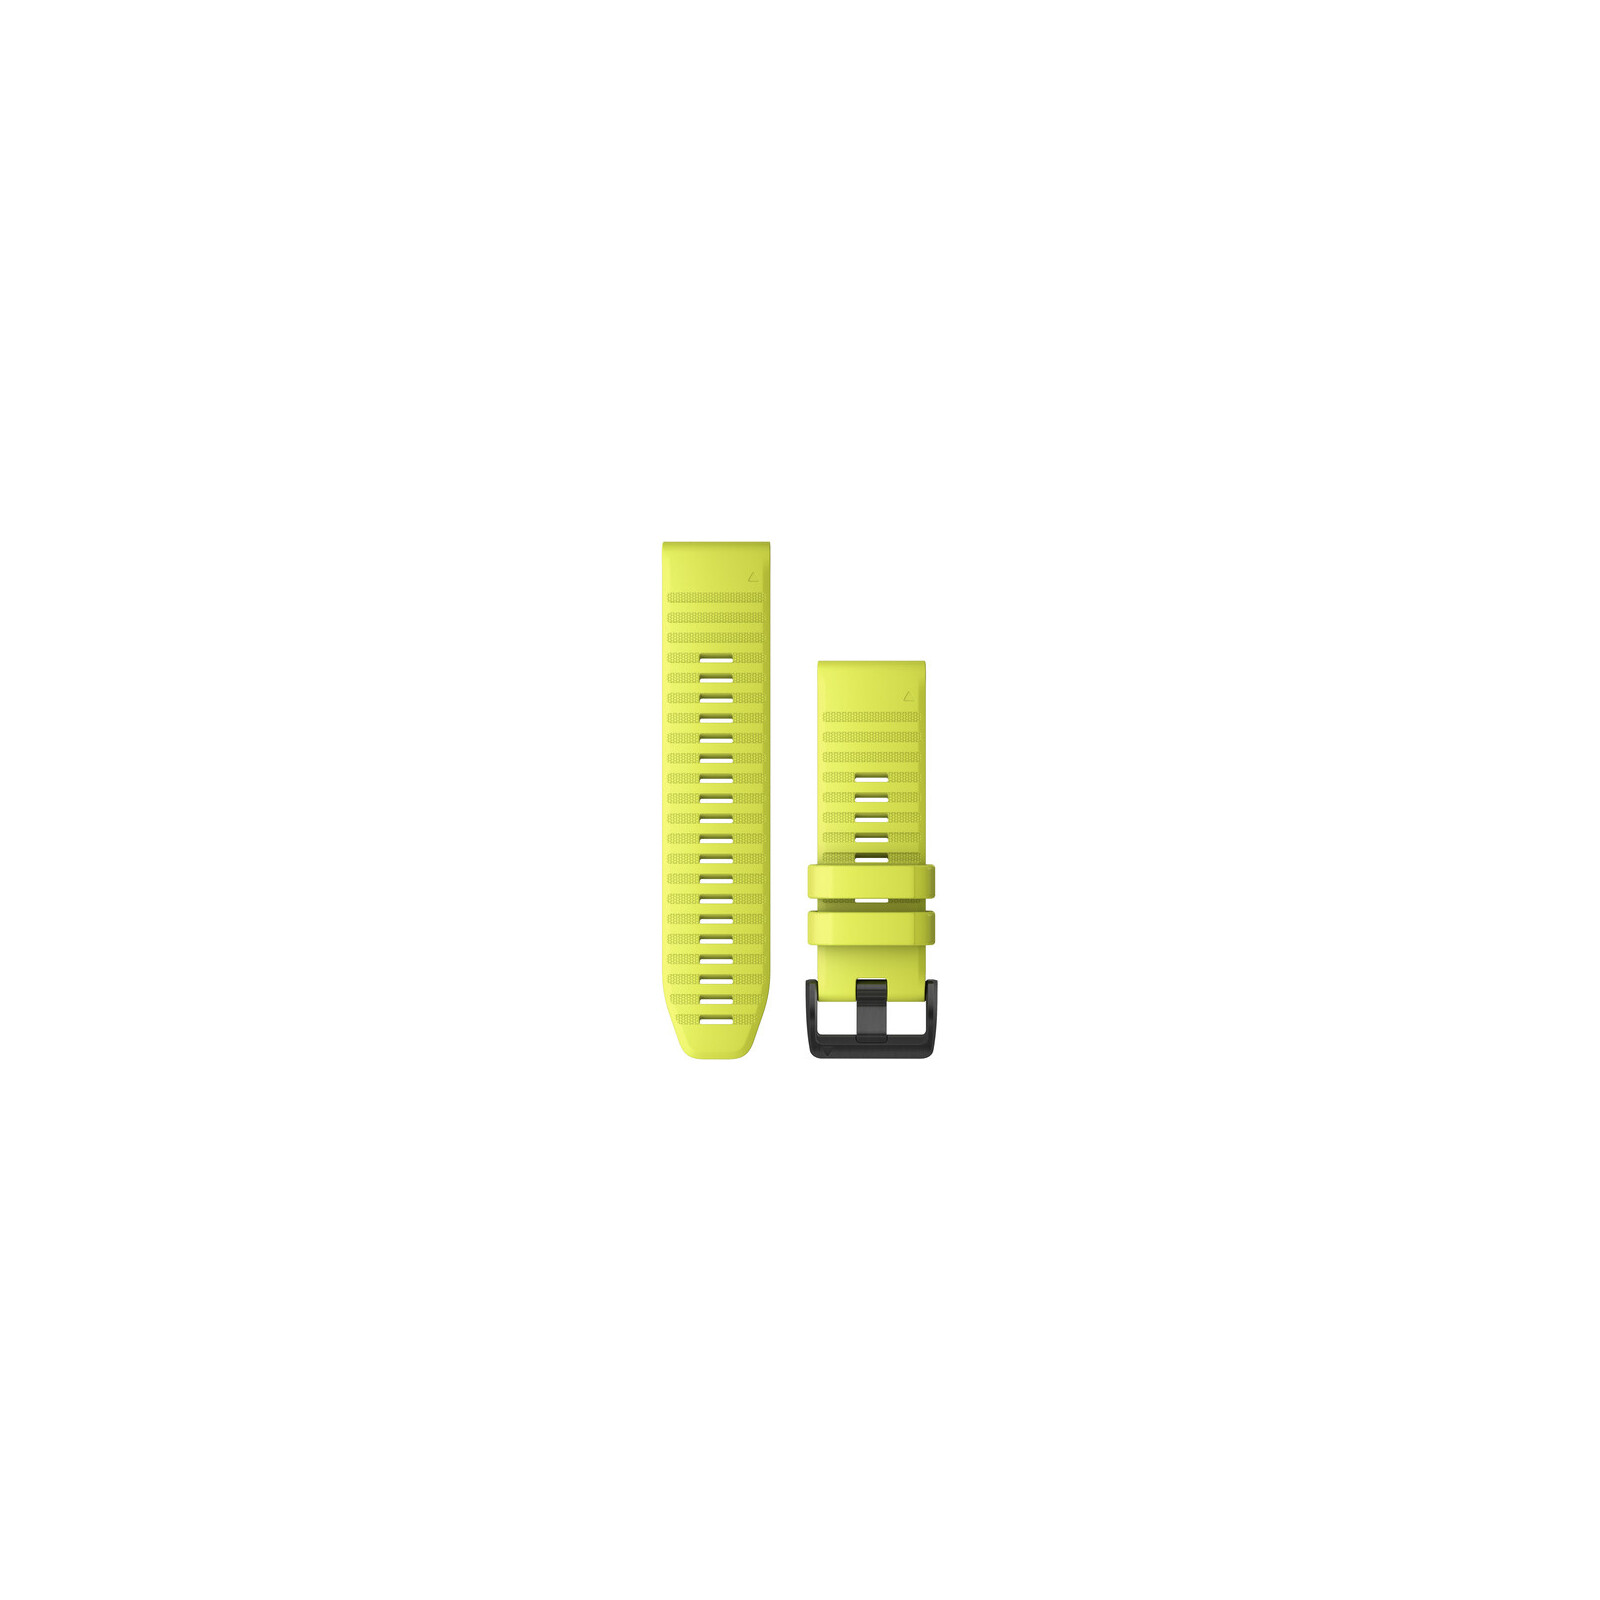 Garmin Quickfit Band 26mm Silikon leuchtgelb schwarz